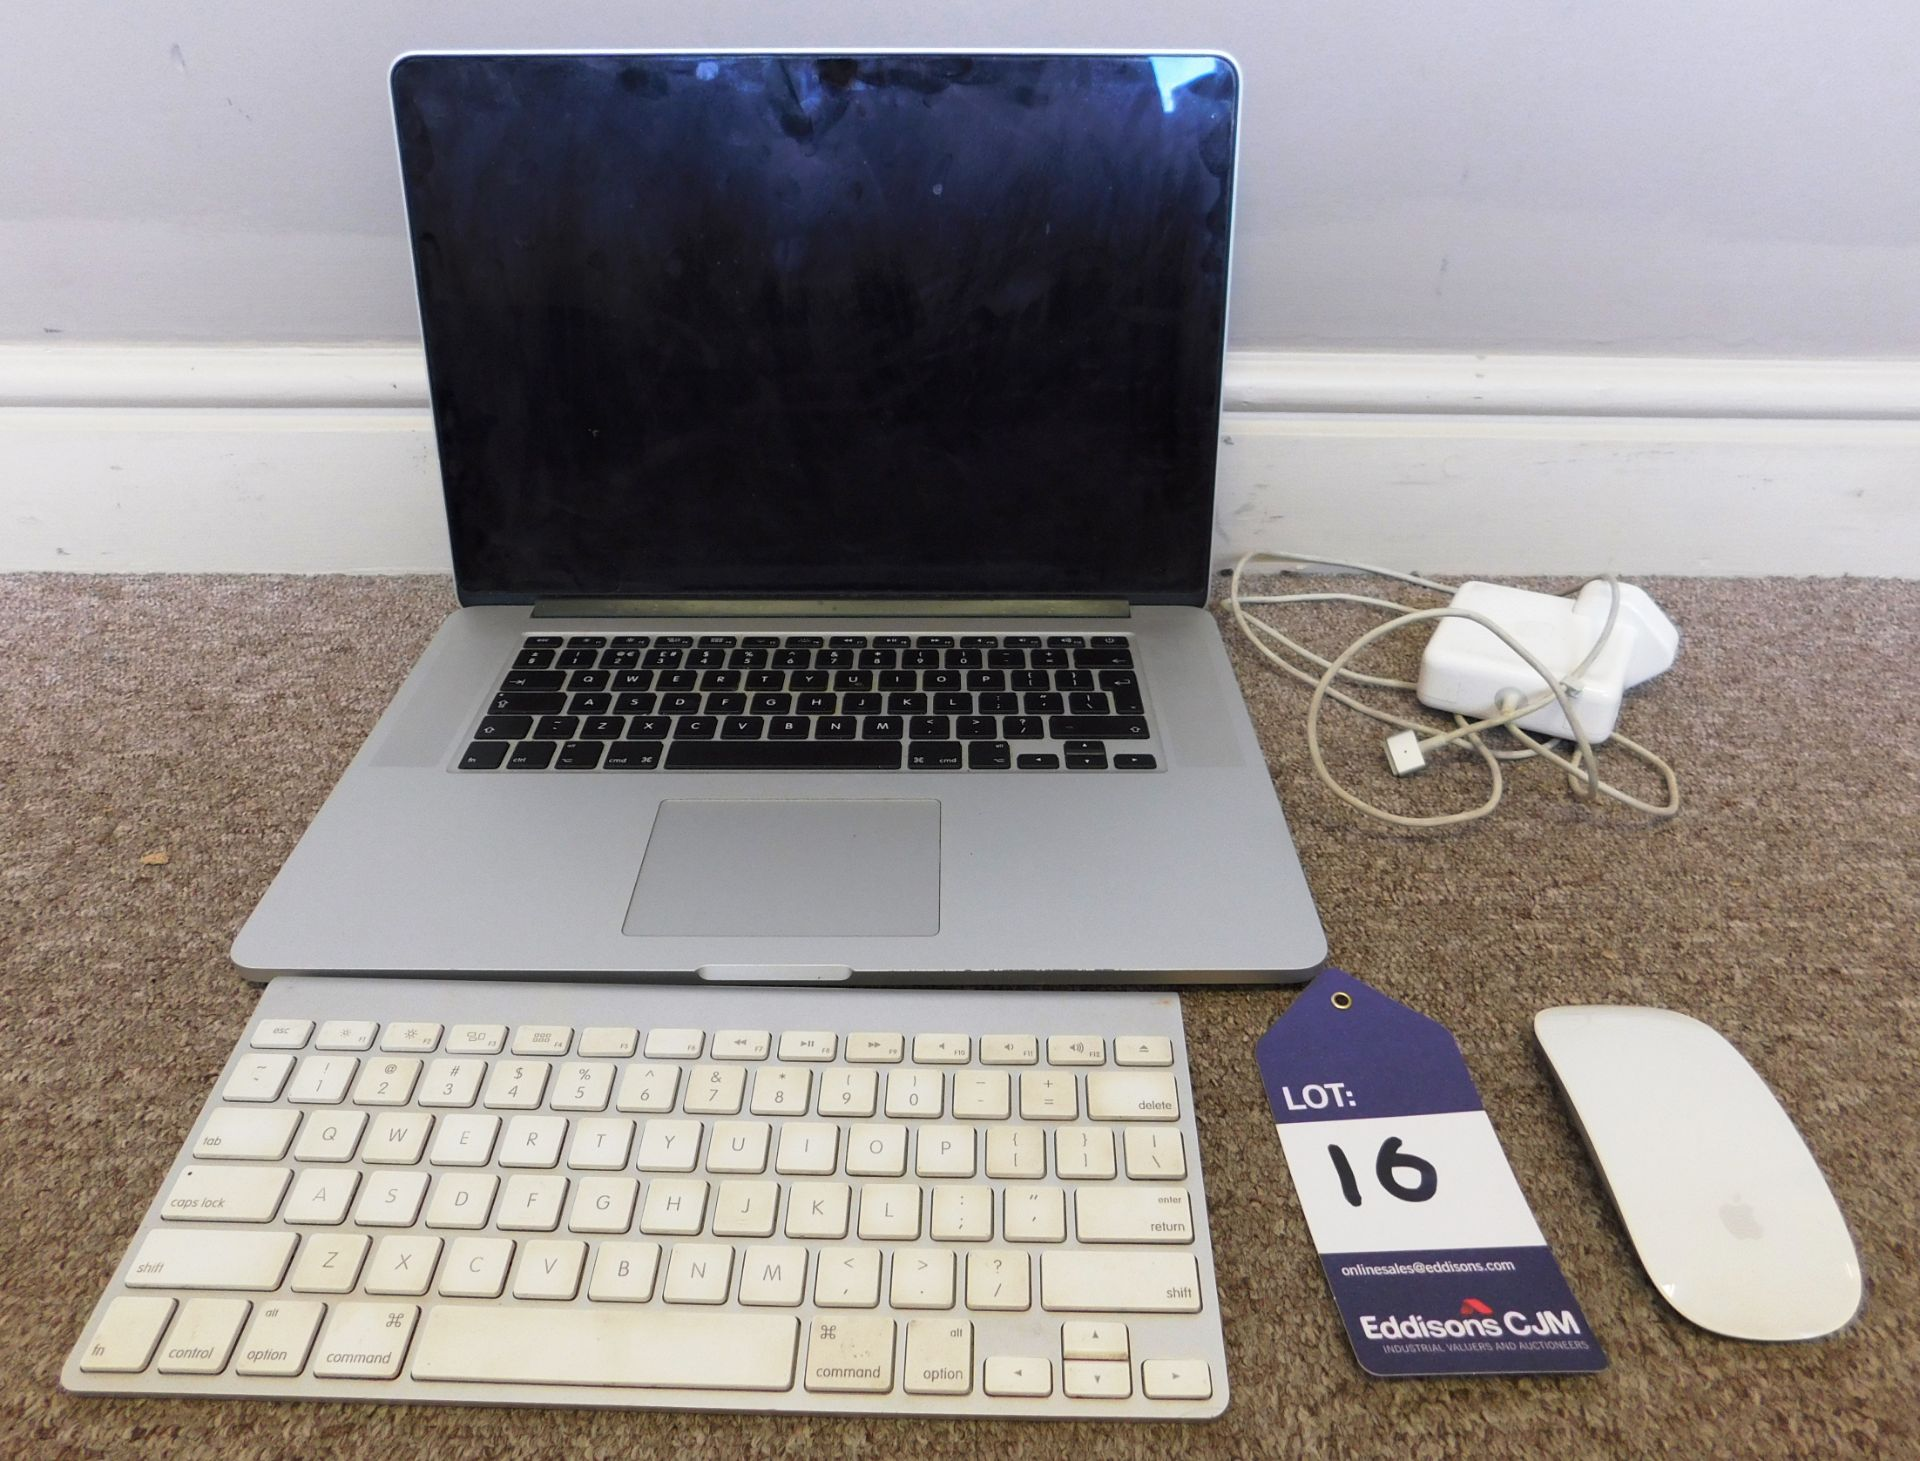 Apple MacBook Pro Retina A1398 15.4 inch Laptop wi - Image 2 of 2